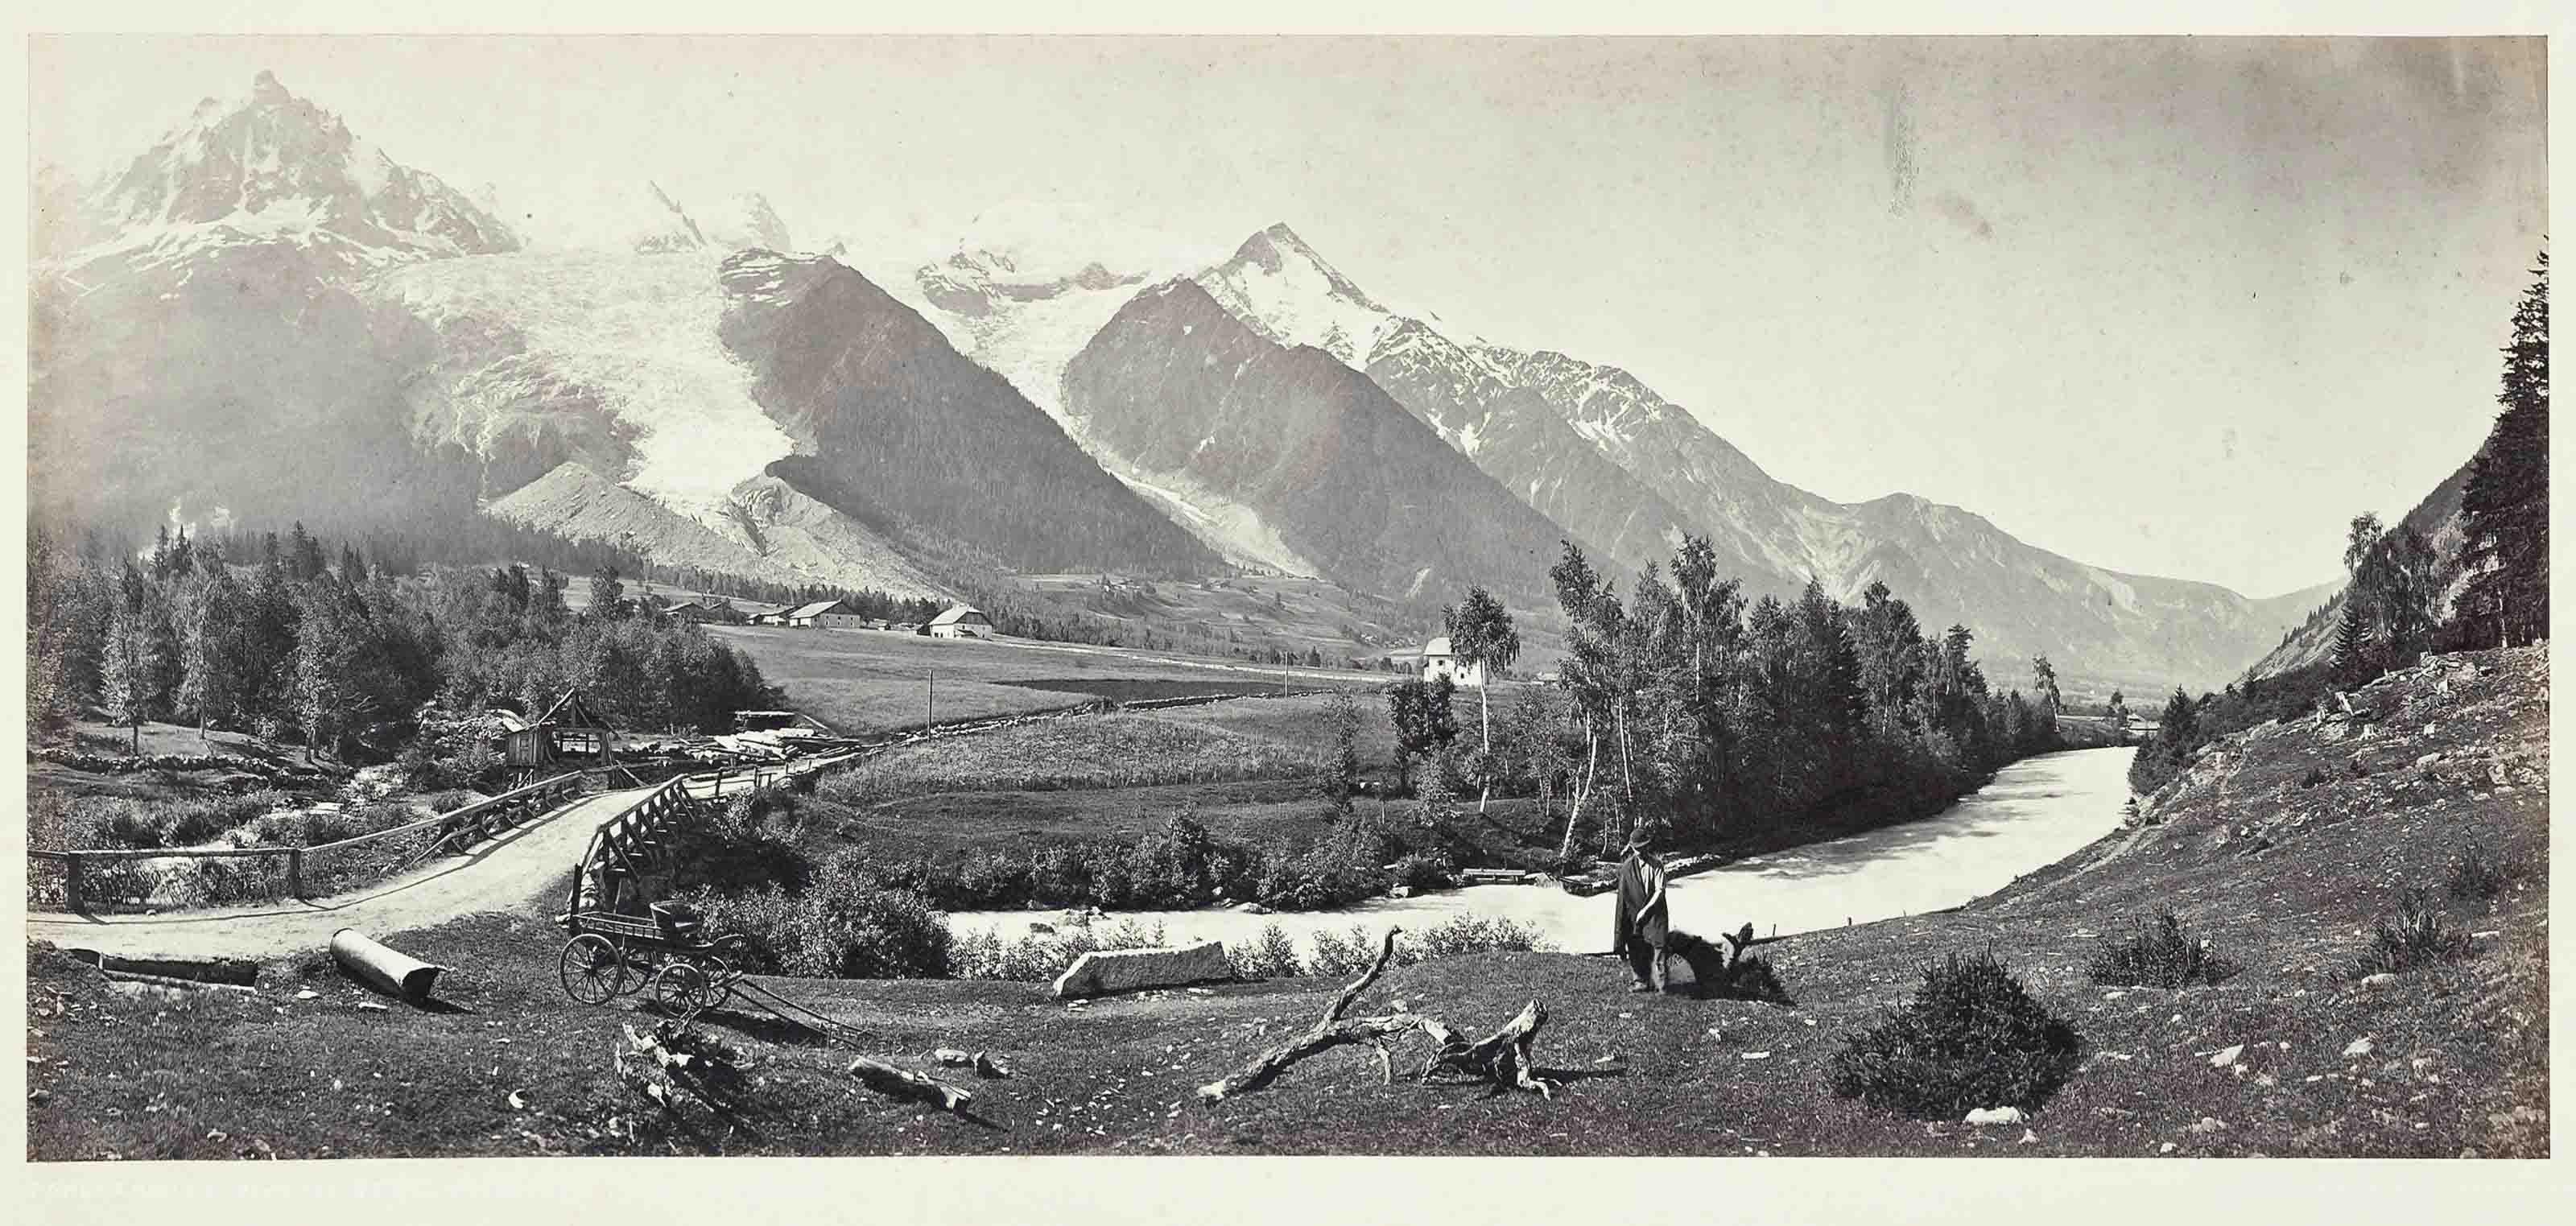 Vallée de Chamonix; Vallée de Chamonix; and Environs de Kandersteg